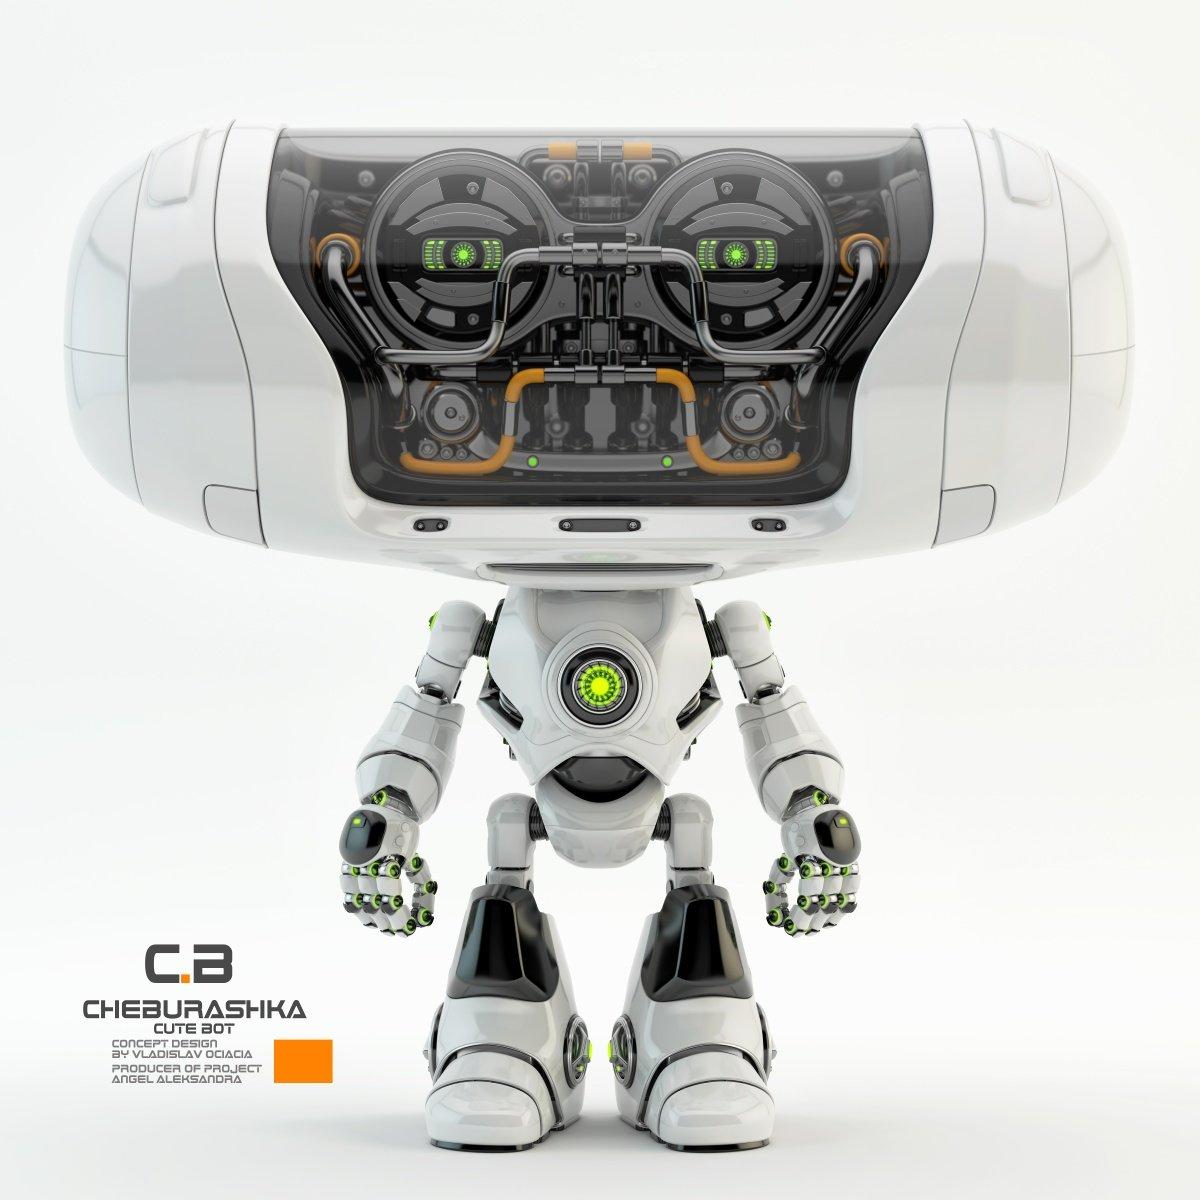 Vladislav ociacia cheburashka robot 2